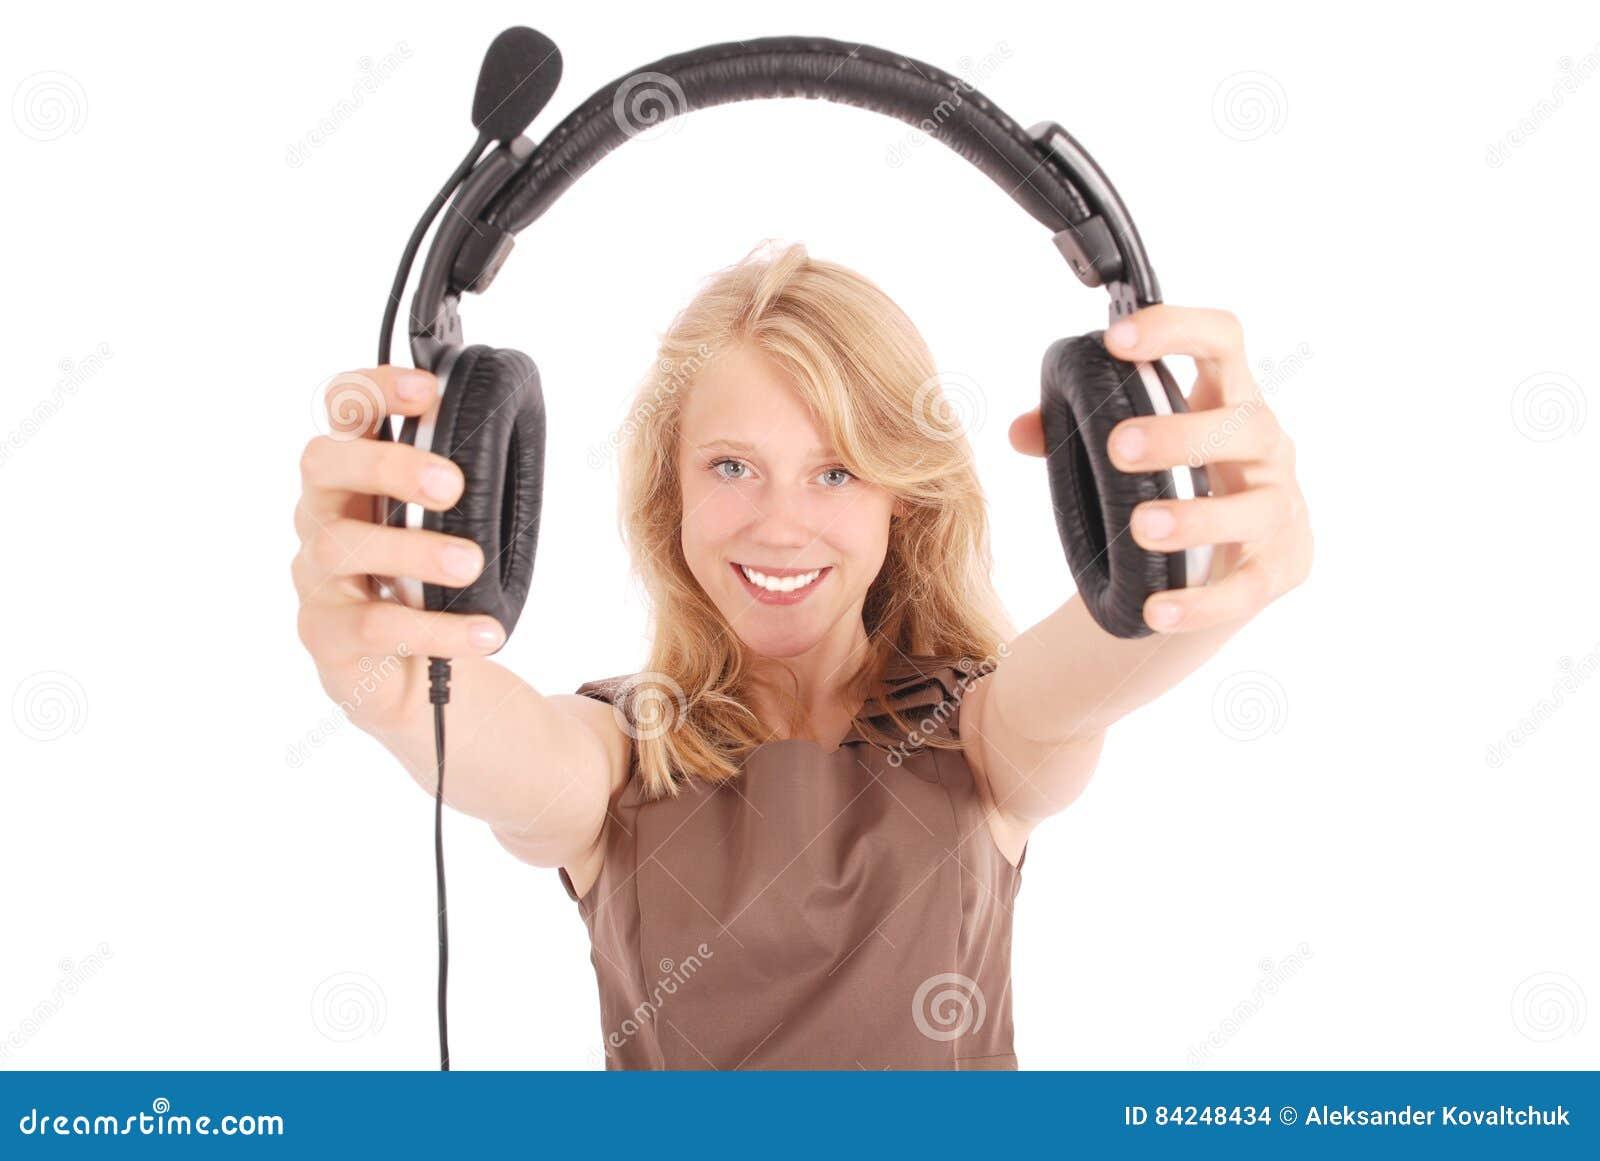 Beautiful customer service operator student girl with headset